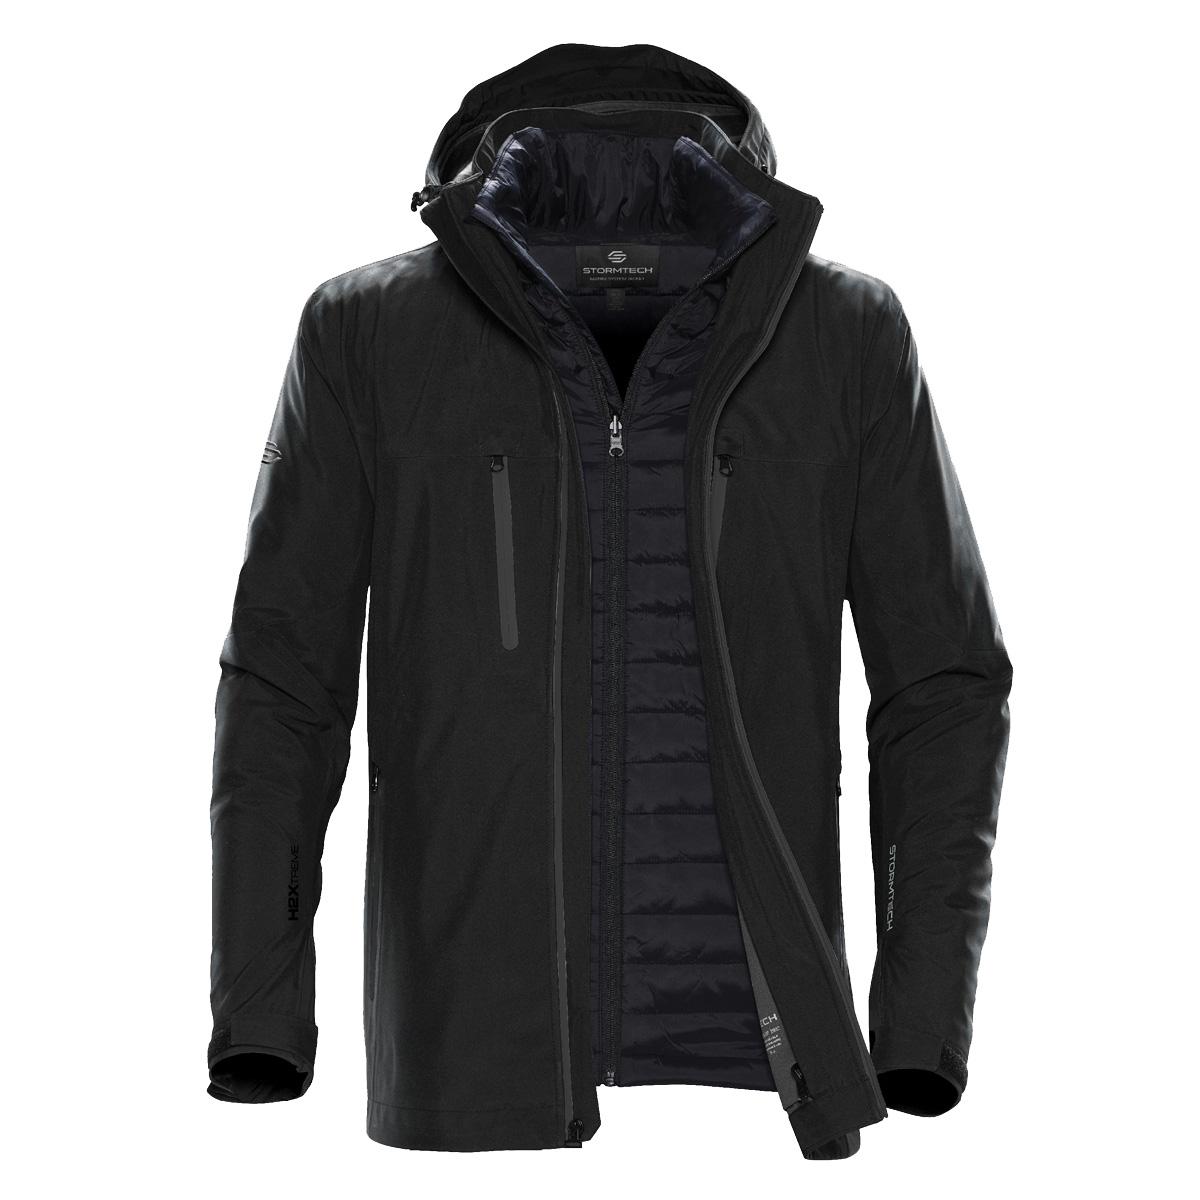 Stormtech Mens Matrix System Jacket (2XL) (Black/Bright Red)